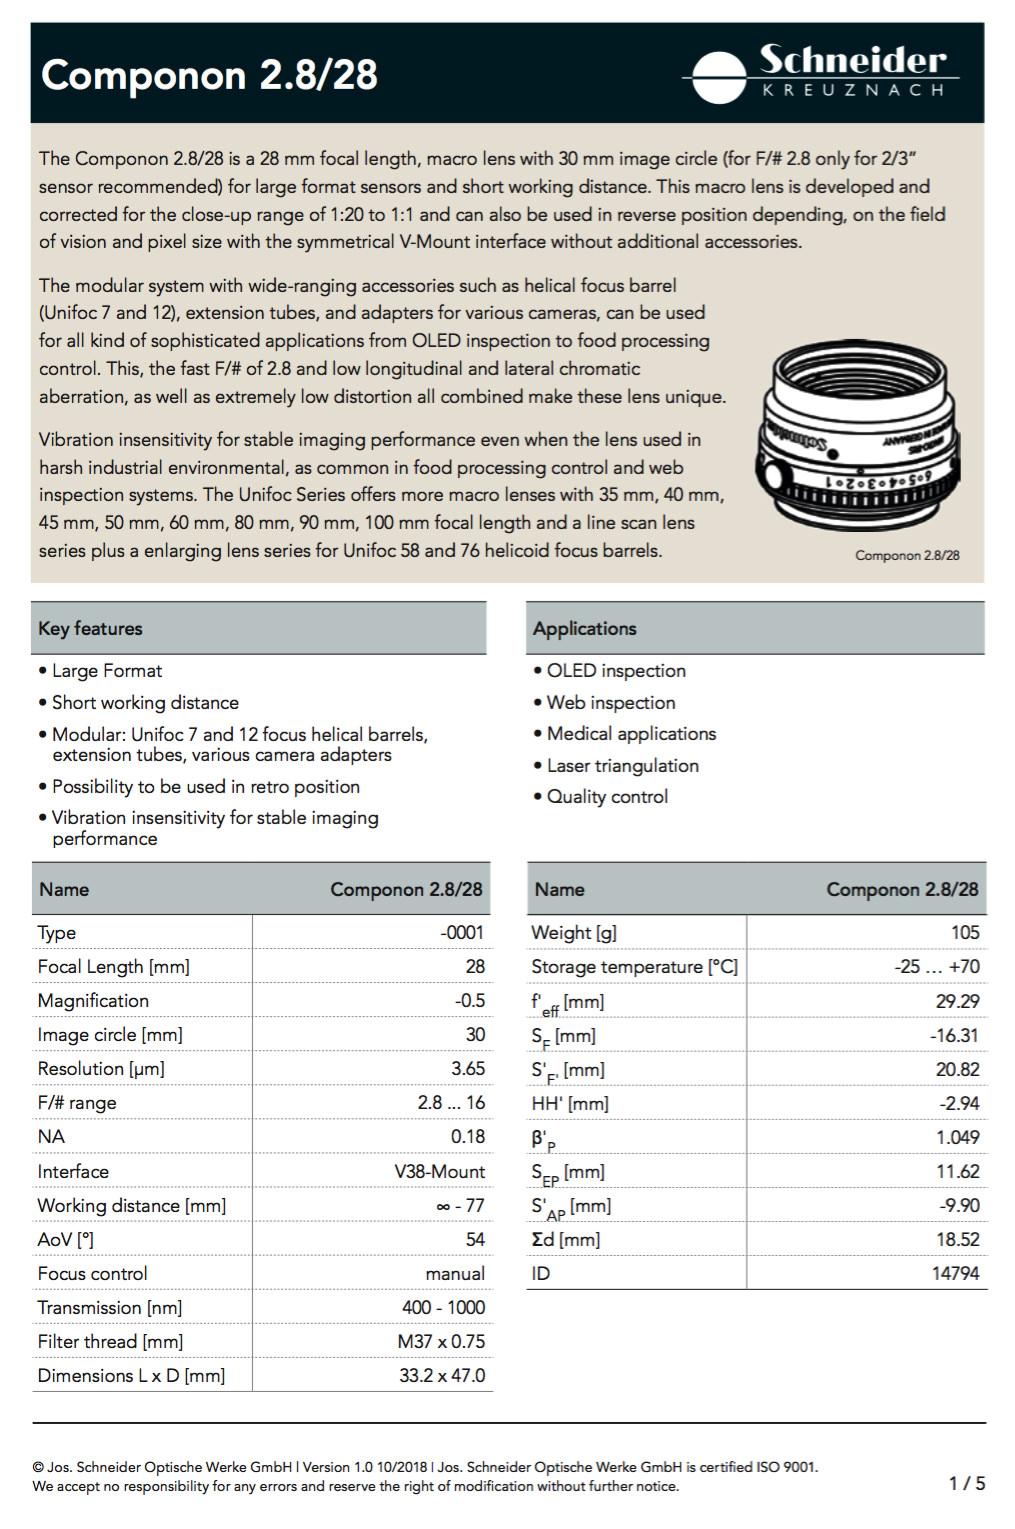 Componon-2.8-28-Data-sheet-New.jpg